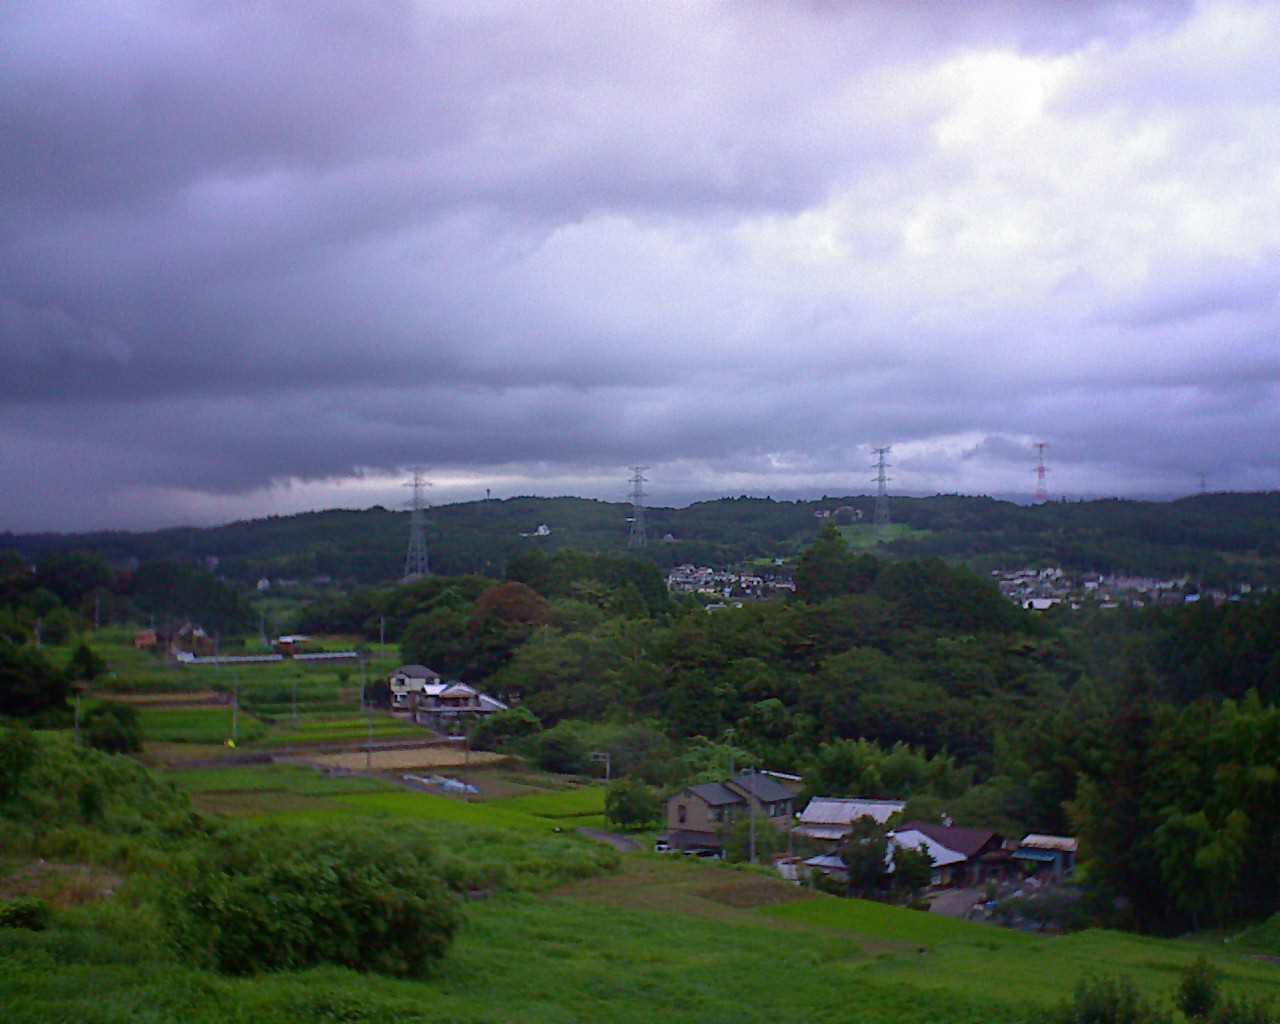 富士山ライブカメラ(富士宮市葛飾北斎カメラ)